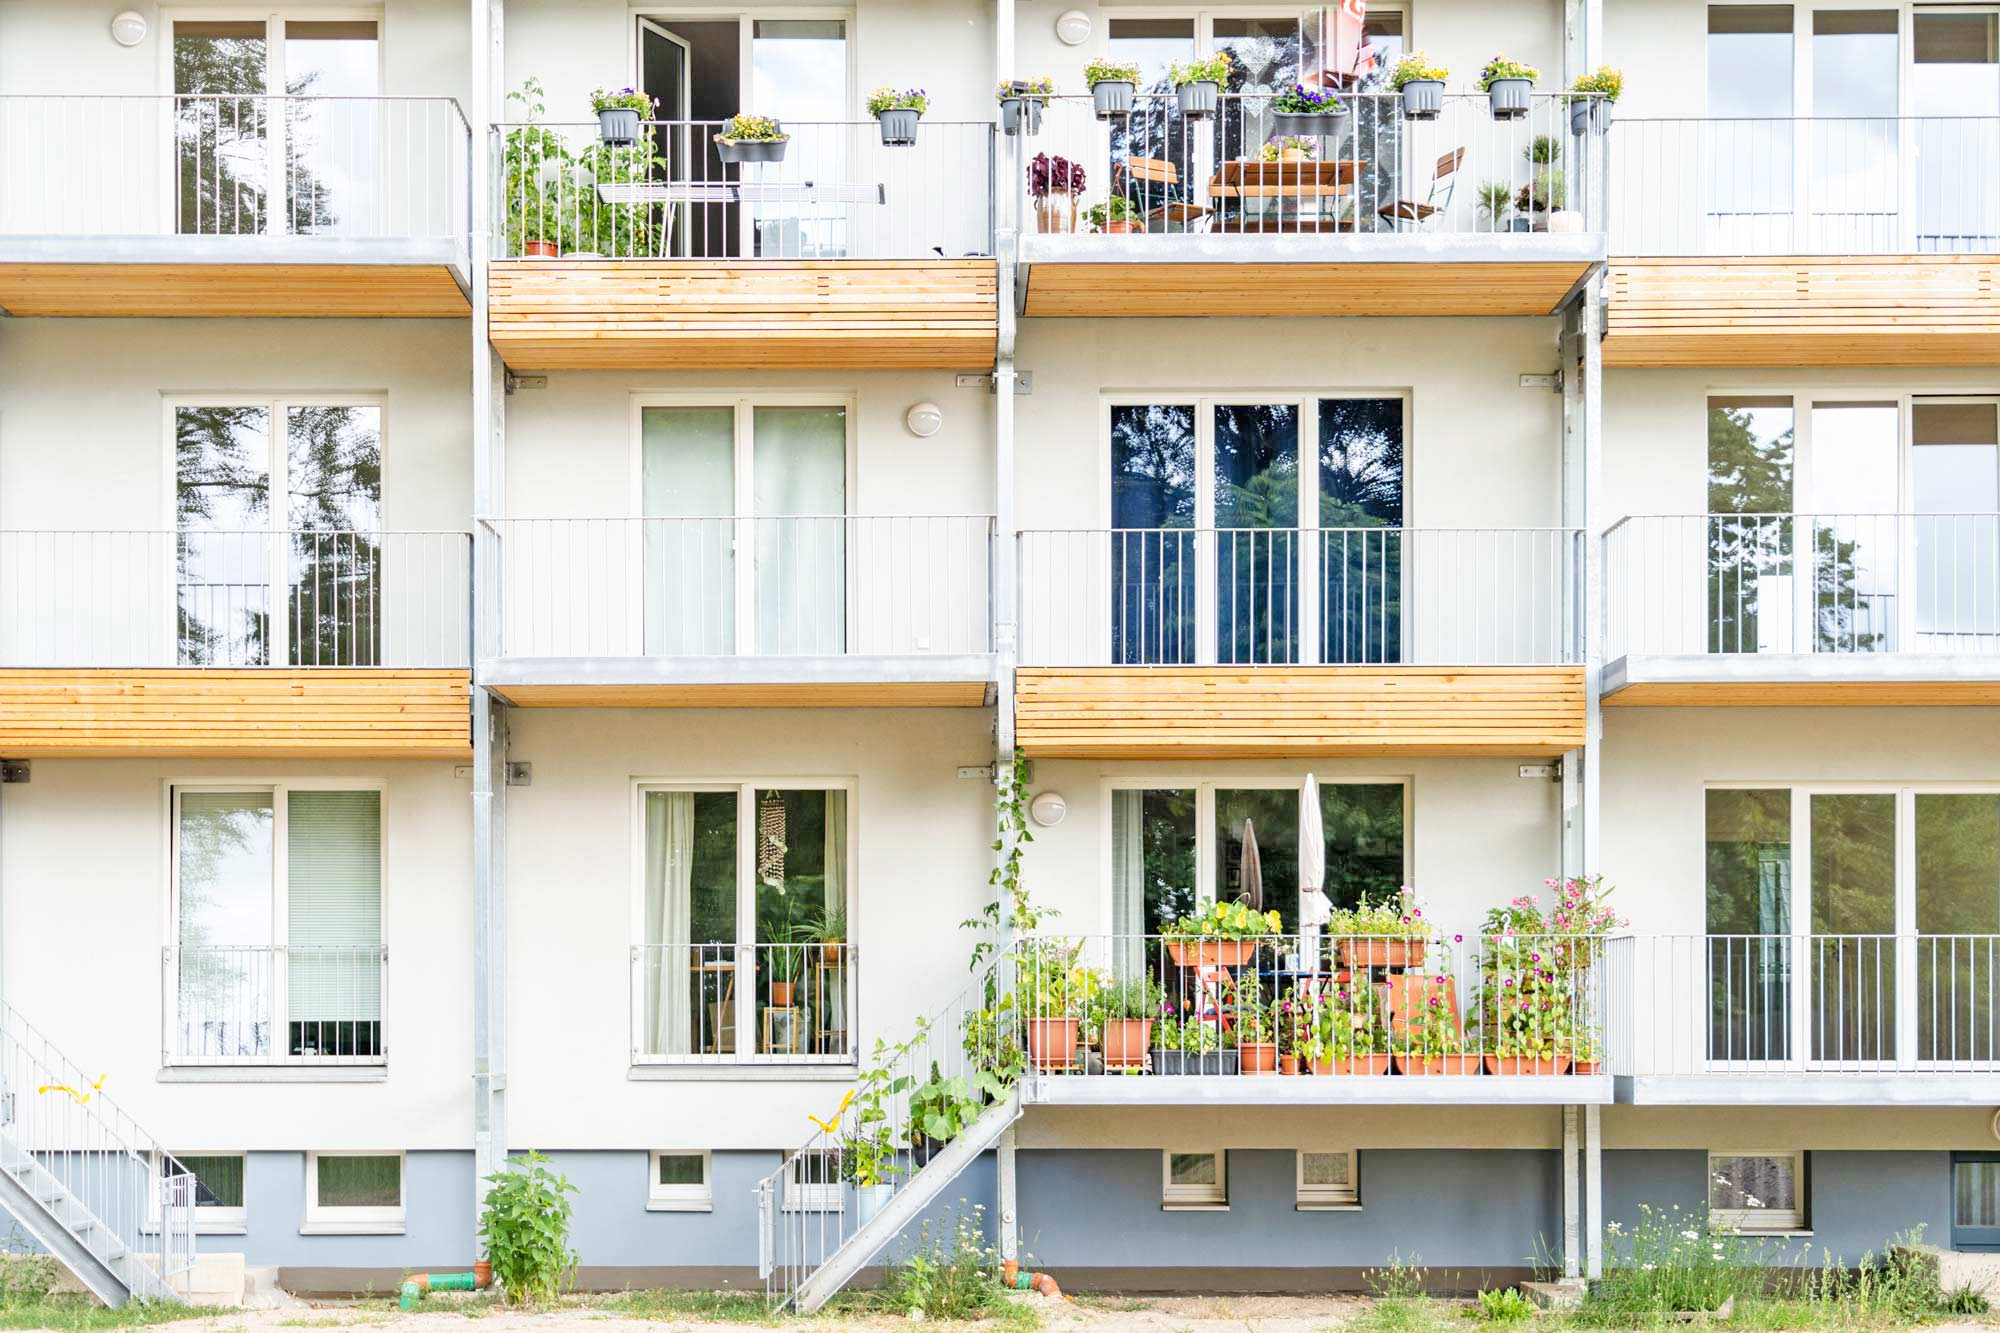 STUDIOKUBIK-architektur-architecture-berlin-Umbau-g21-balkon-7